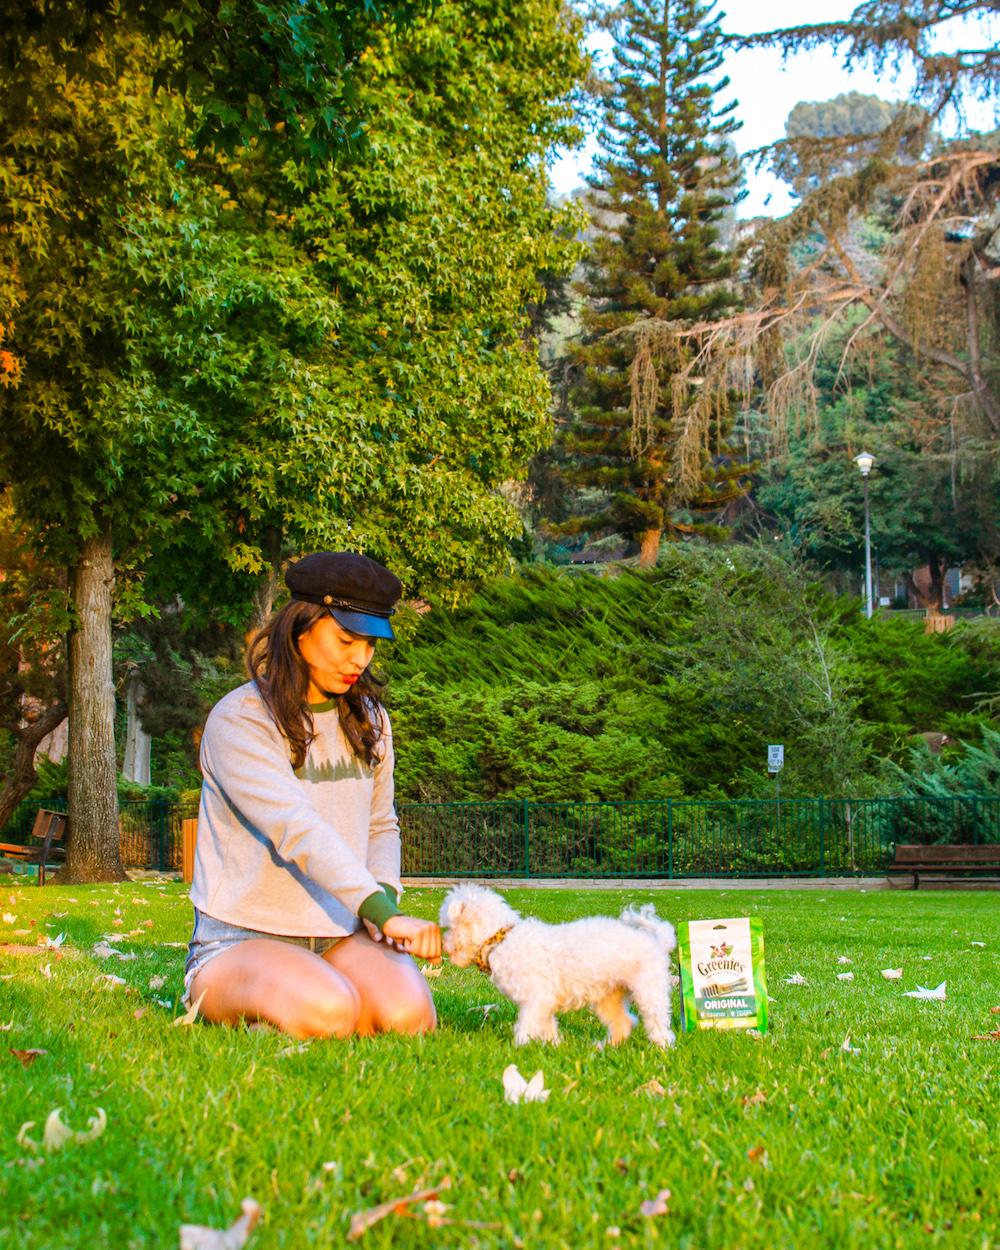 woman giving treats to dog at park